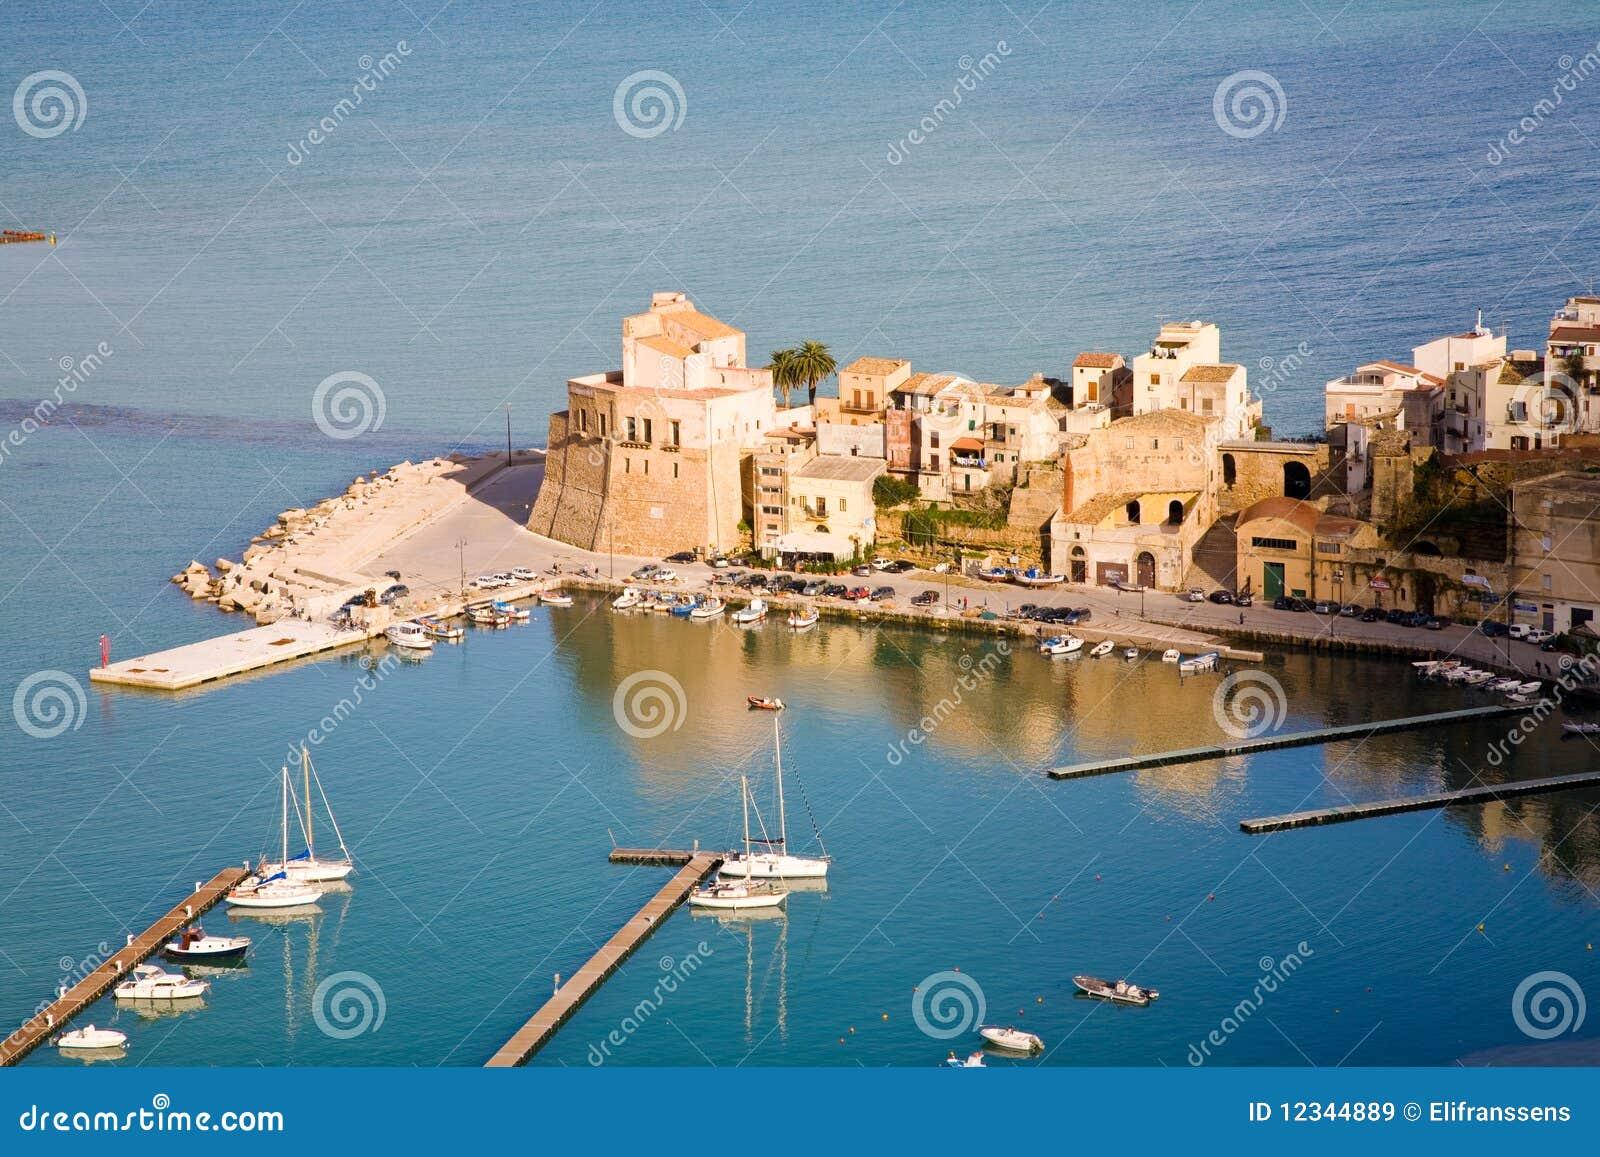 Castellammare del golfo sicily italy stock photo image 48782909 - Castellammare Del Golfo In The